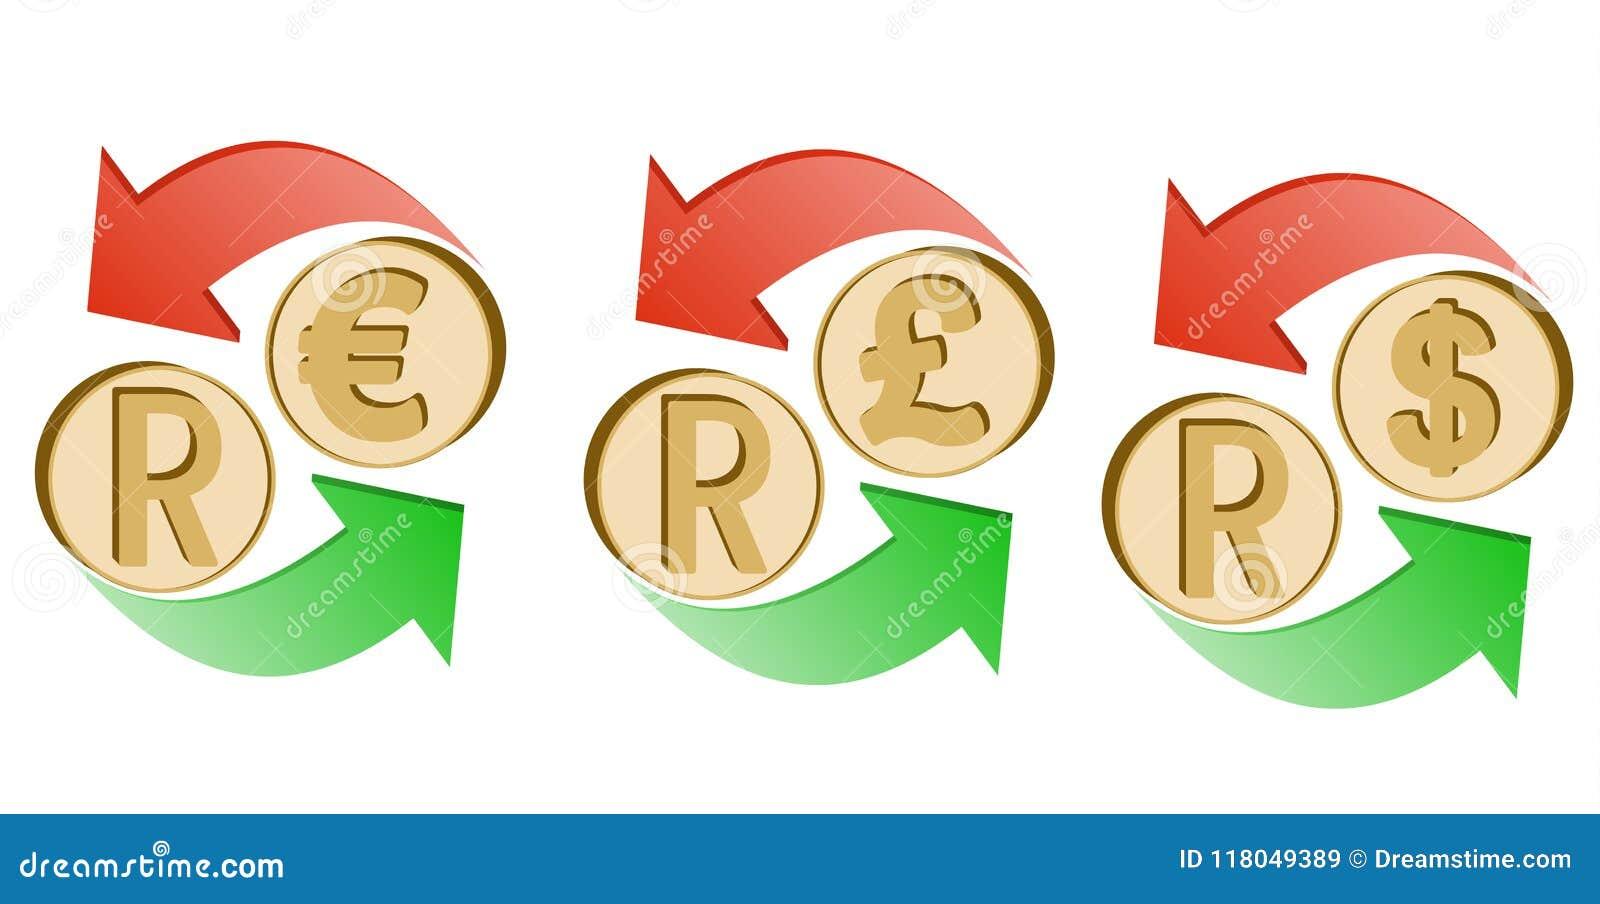 3D Dollar Rand Crossword Royalty-Free Stock Image | CartoonDealer.com #92013748